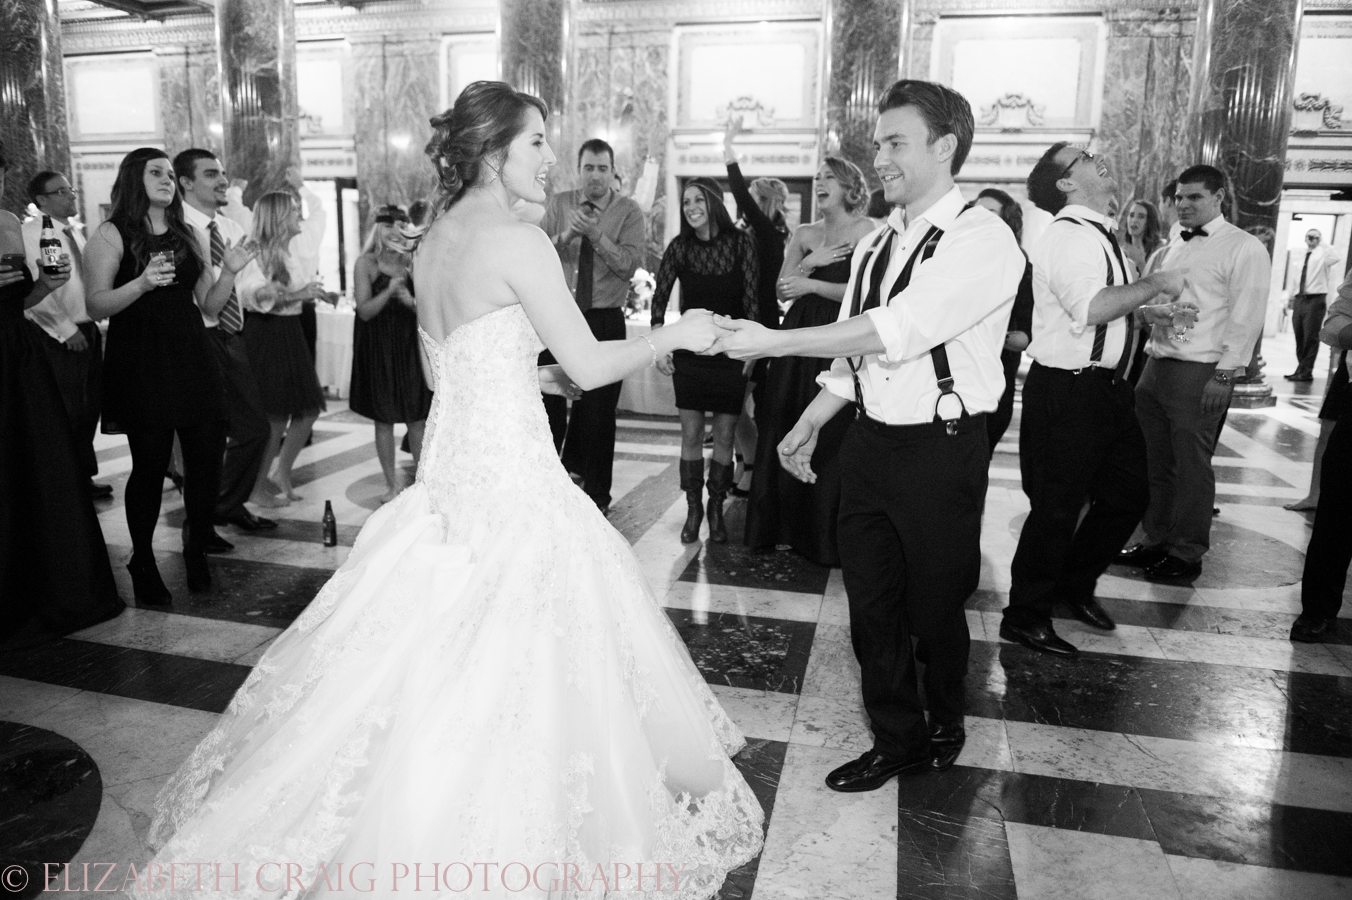 Carnegie Museum of Art Weddings | Elizabeth Craig Photography-0179